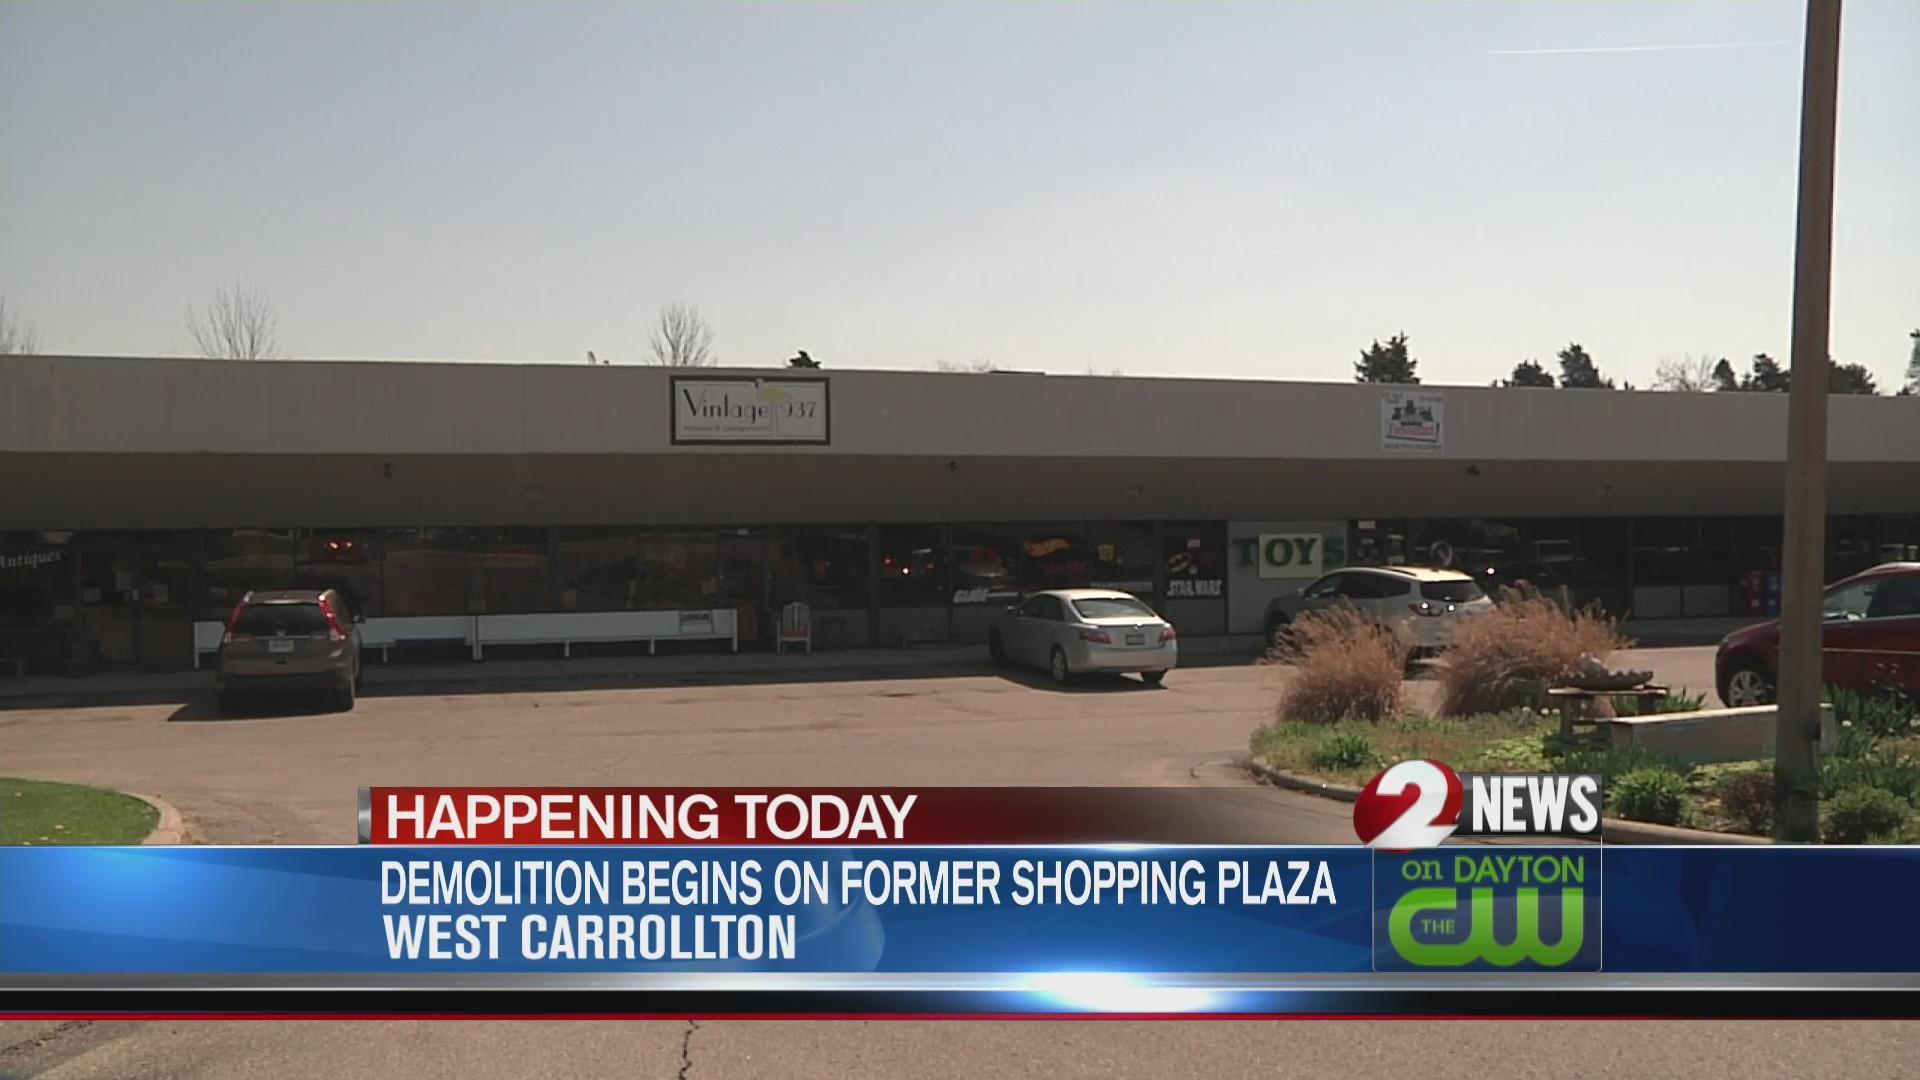 Demolition of West Carrollton plaza begins Monday